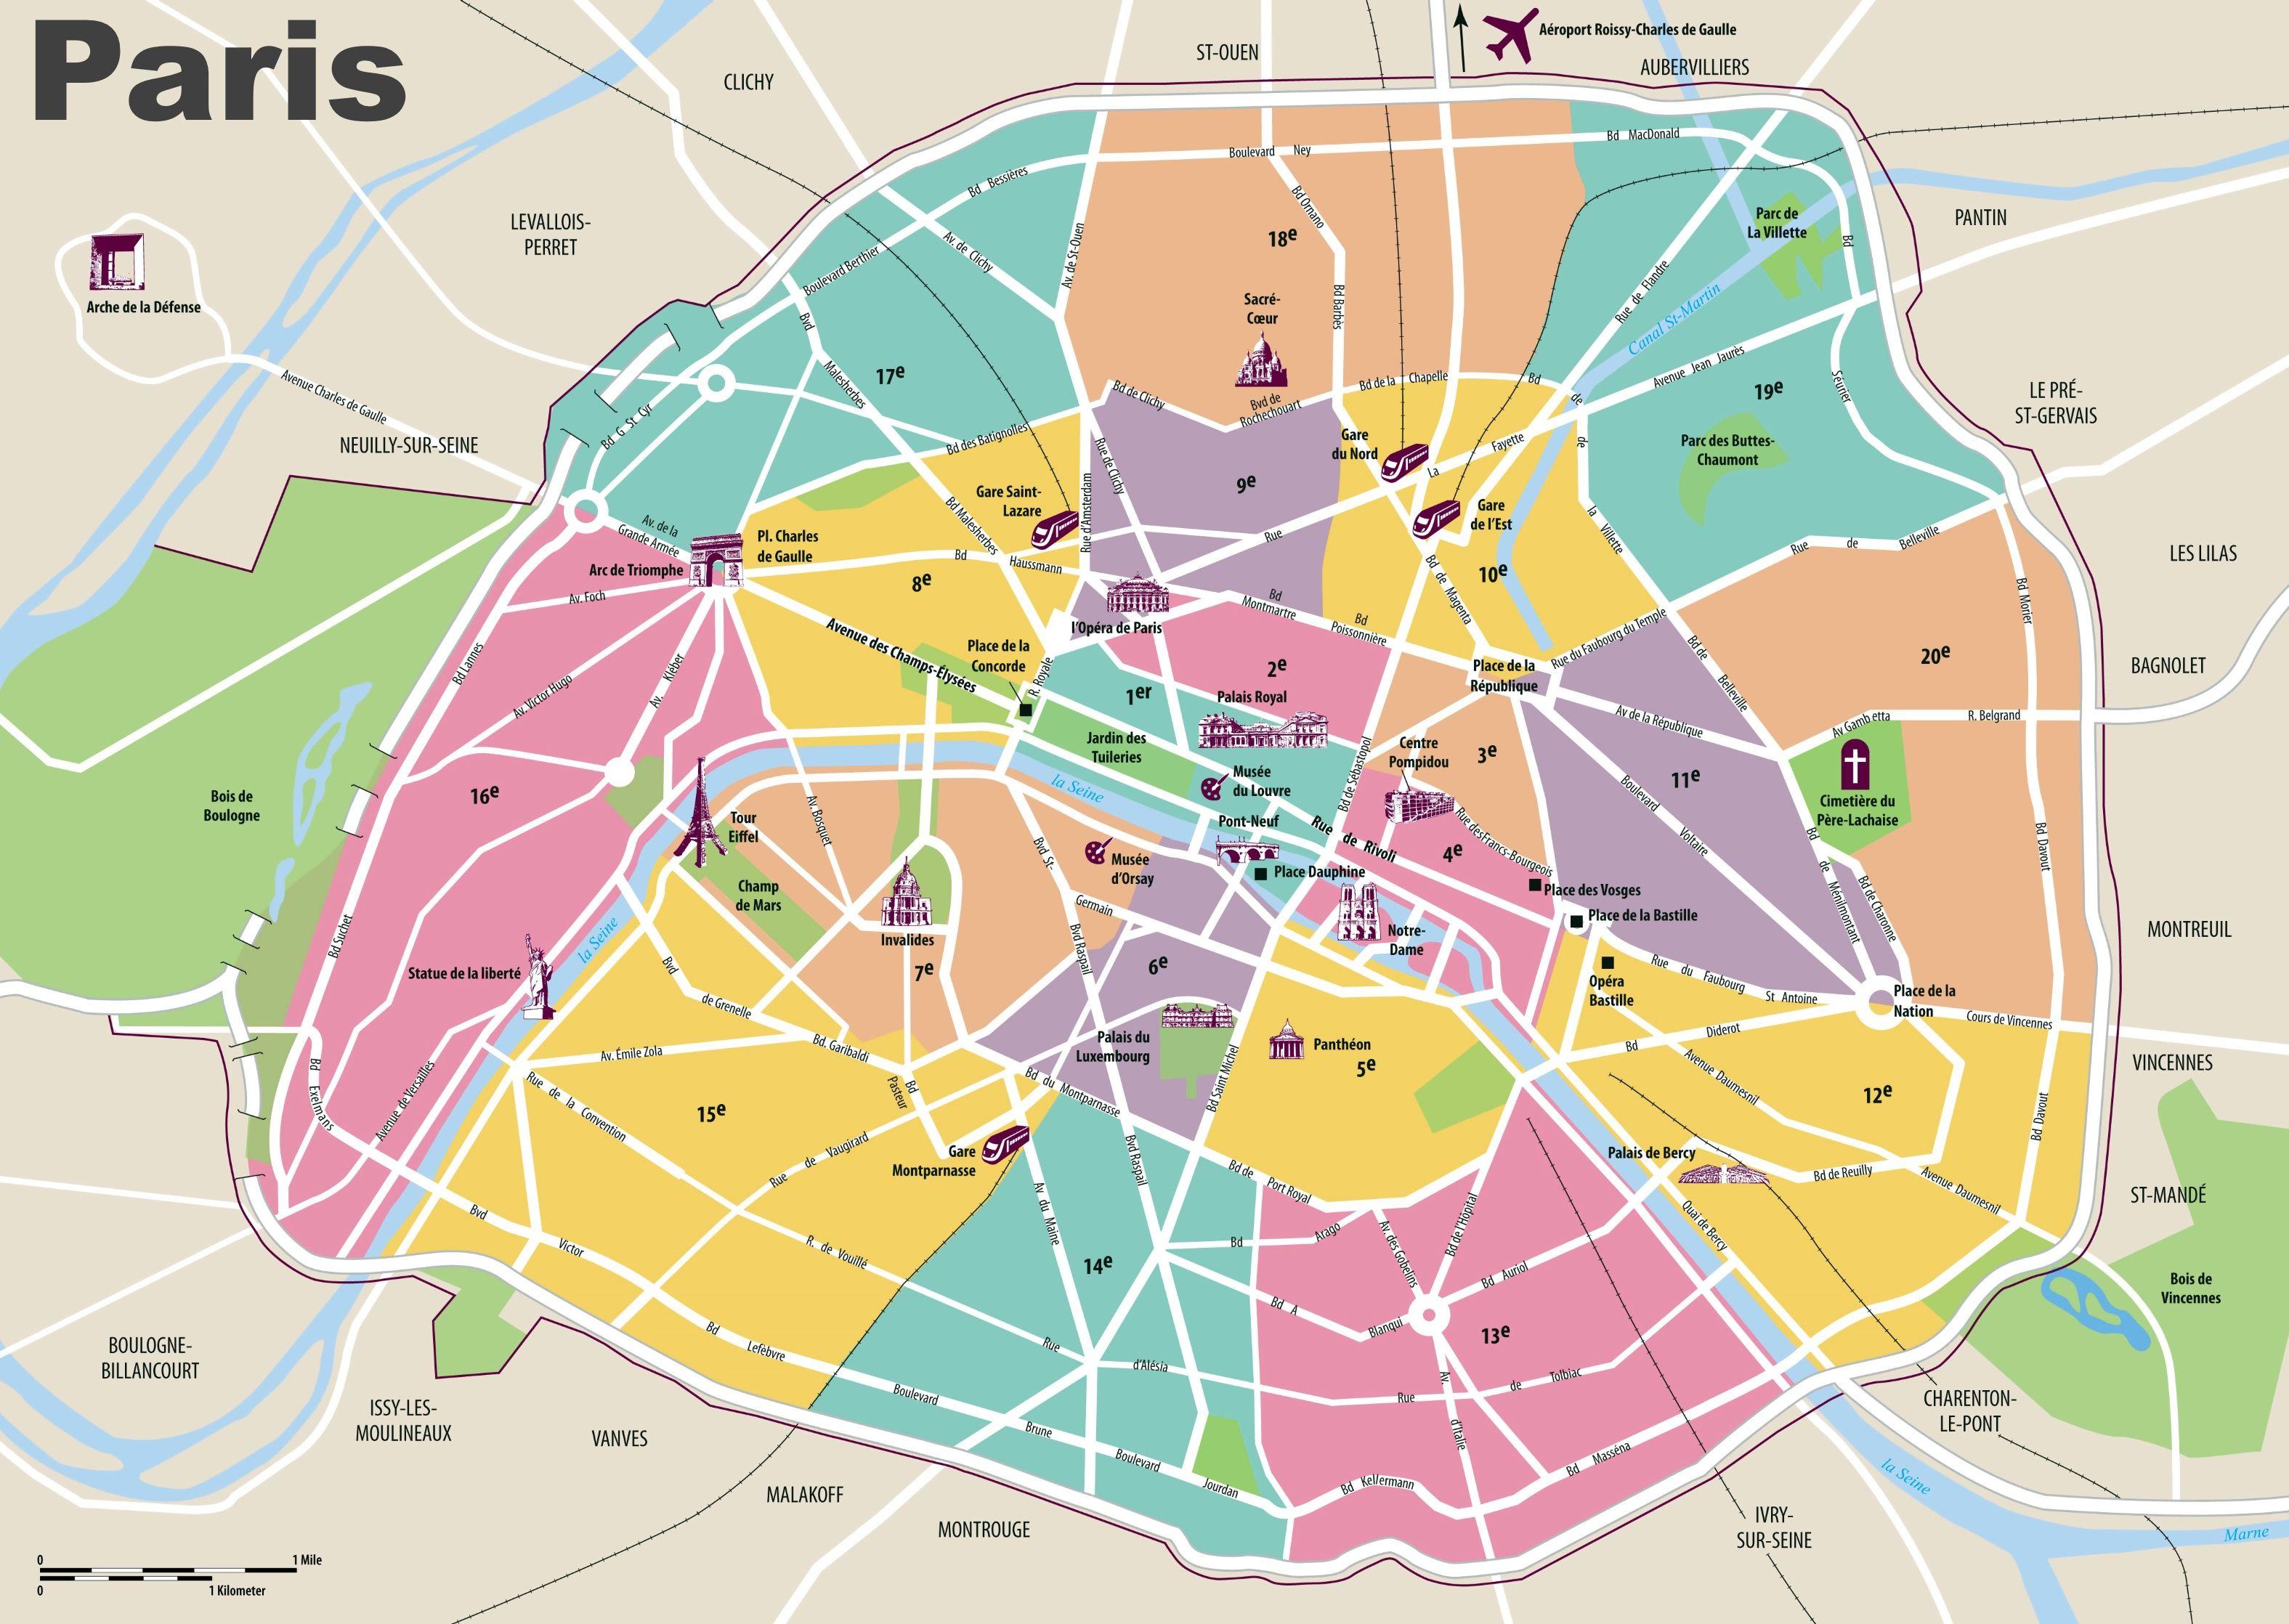 Paris Map District.Pin By Jennifer Dauner On Lord Of The Rings Paris Travel Paris